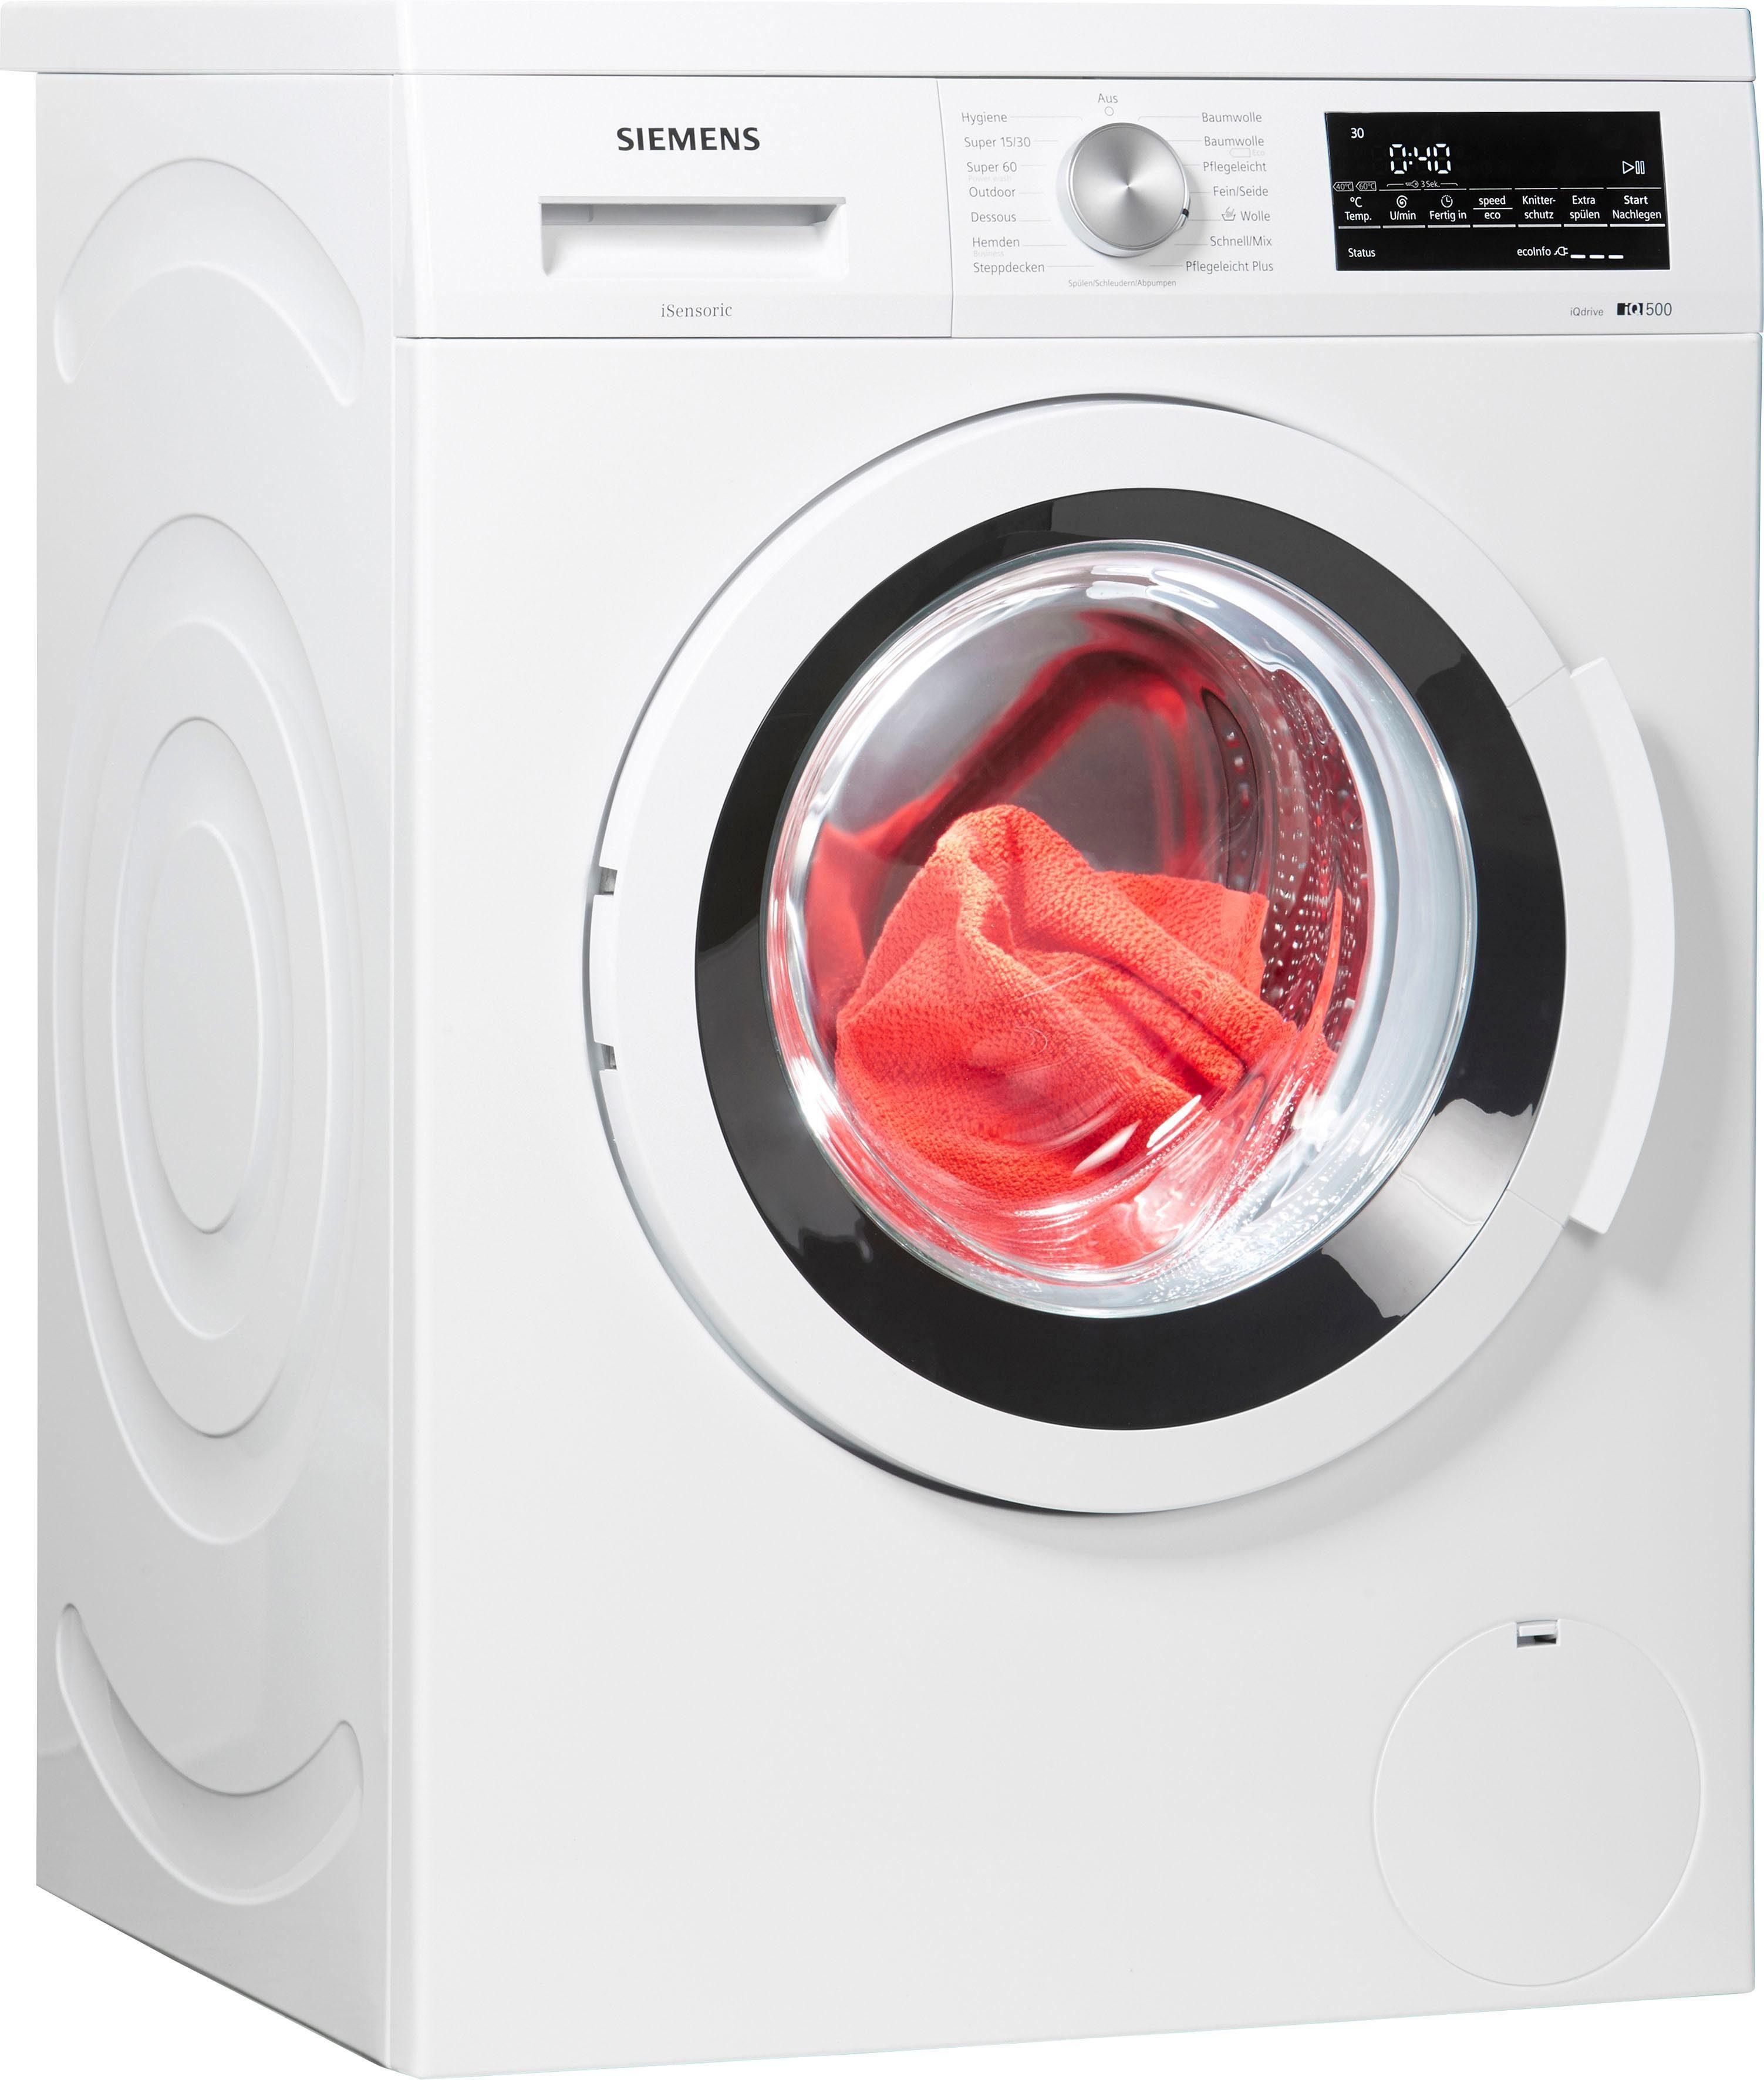 SIEMENS Waschmaschine iQ500 WU14Q4ECO, 8 kg, 1400 U/Min, Unterbaufähig